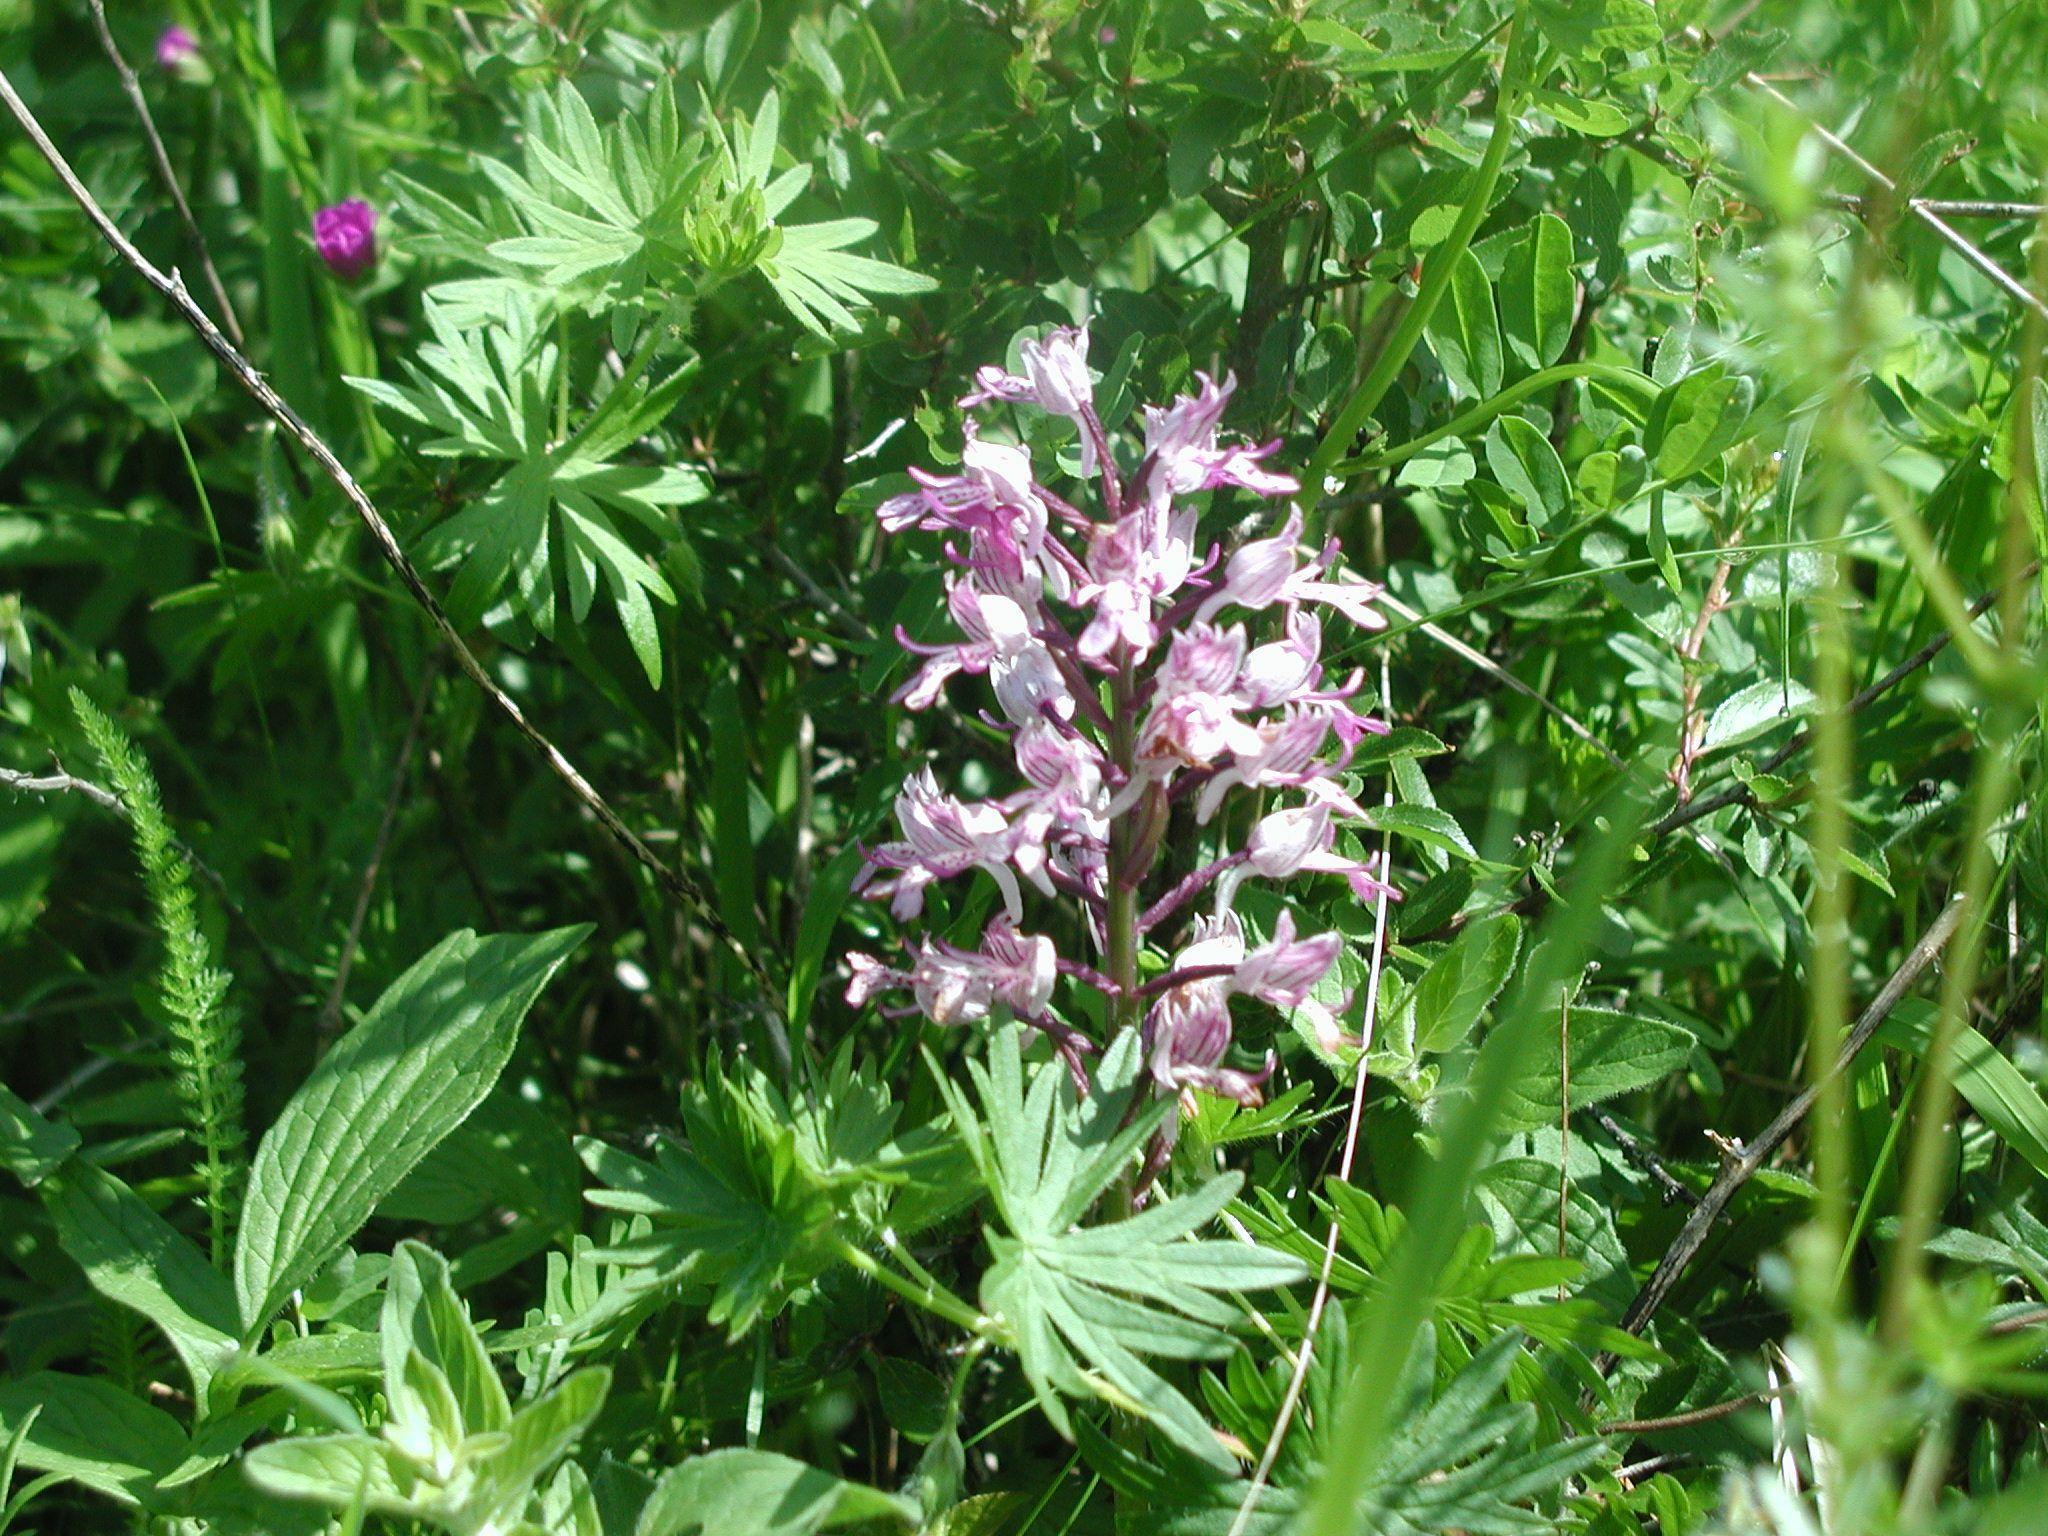 Orchideen wandern franken muschelkalk